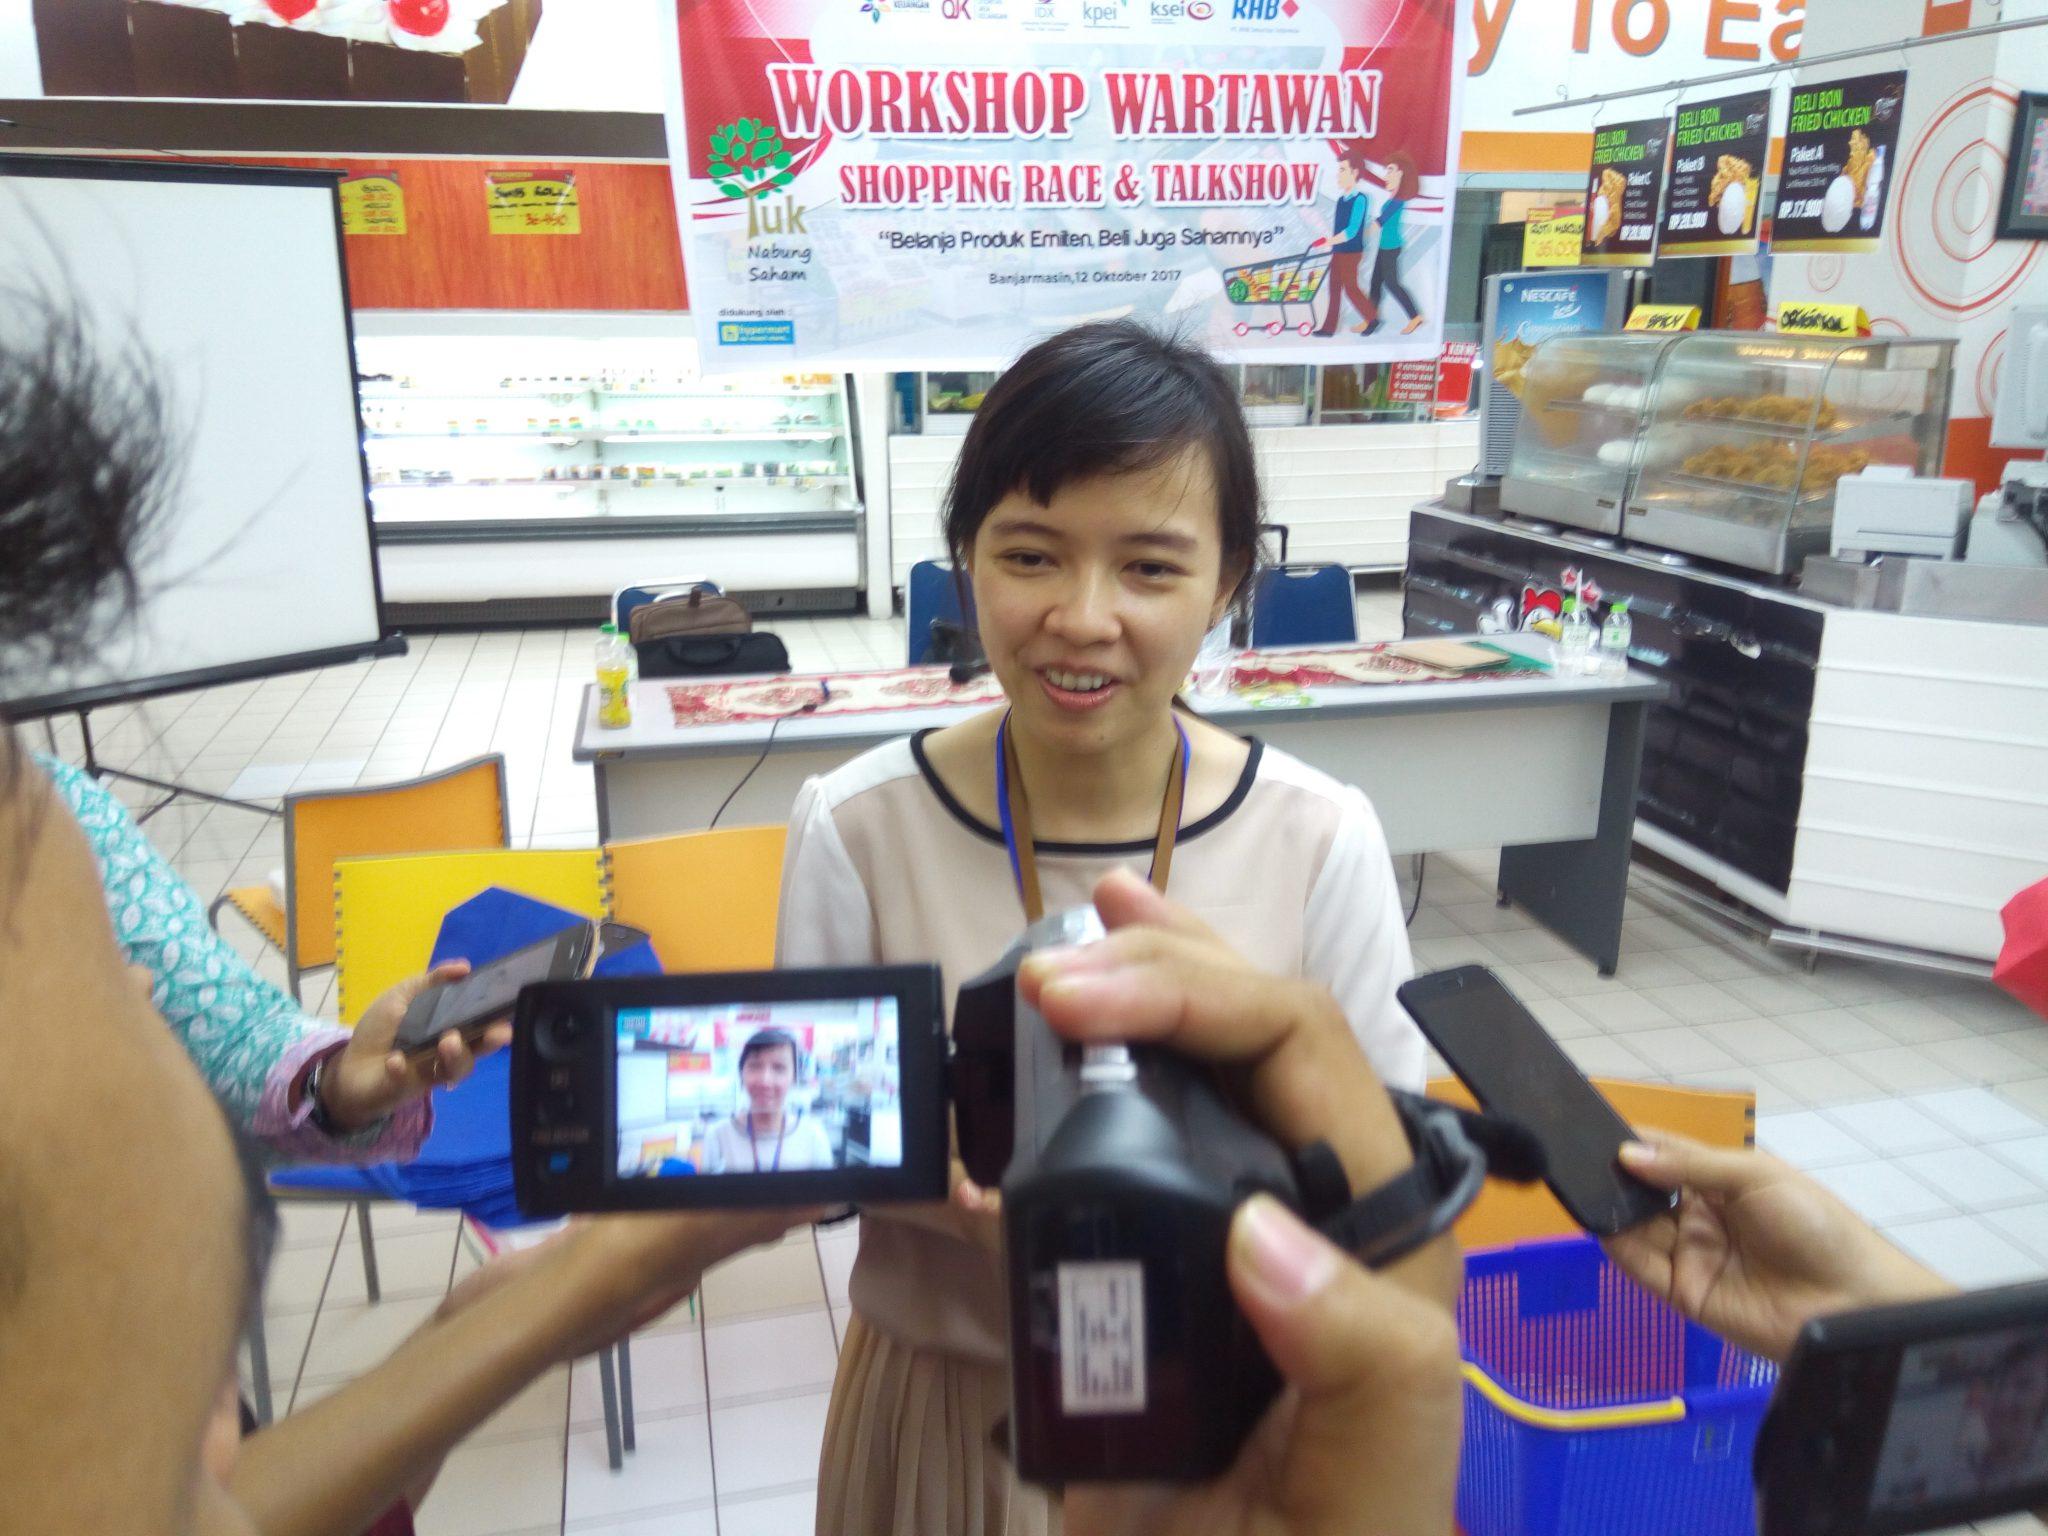 Kenalkan Saham lebih Mendalam, IDX Gelar Workshop Untuk Wartawan